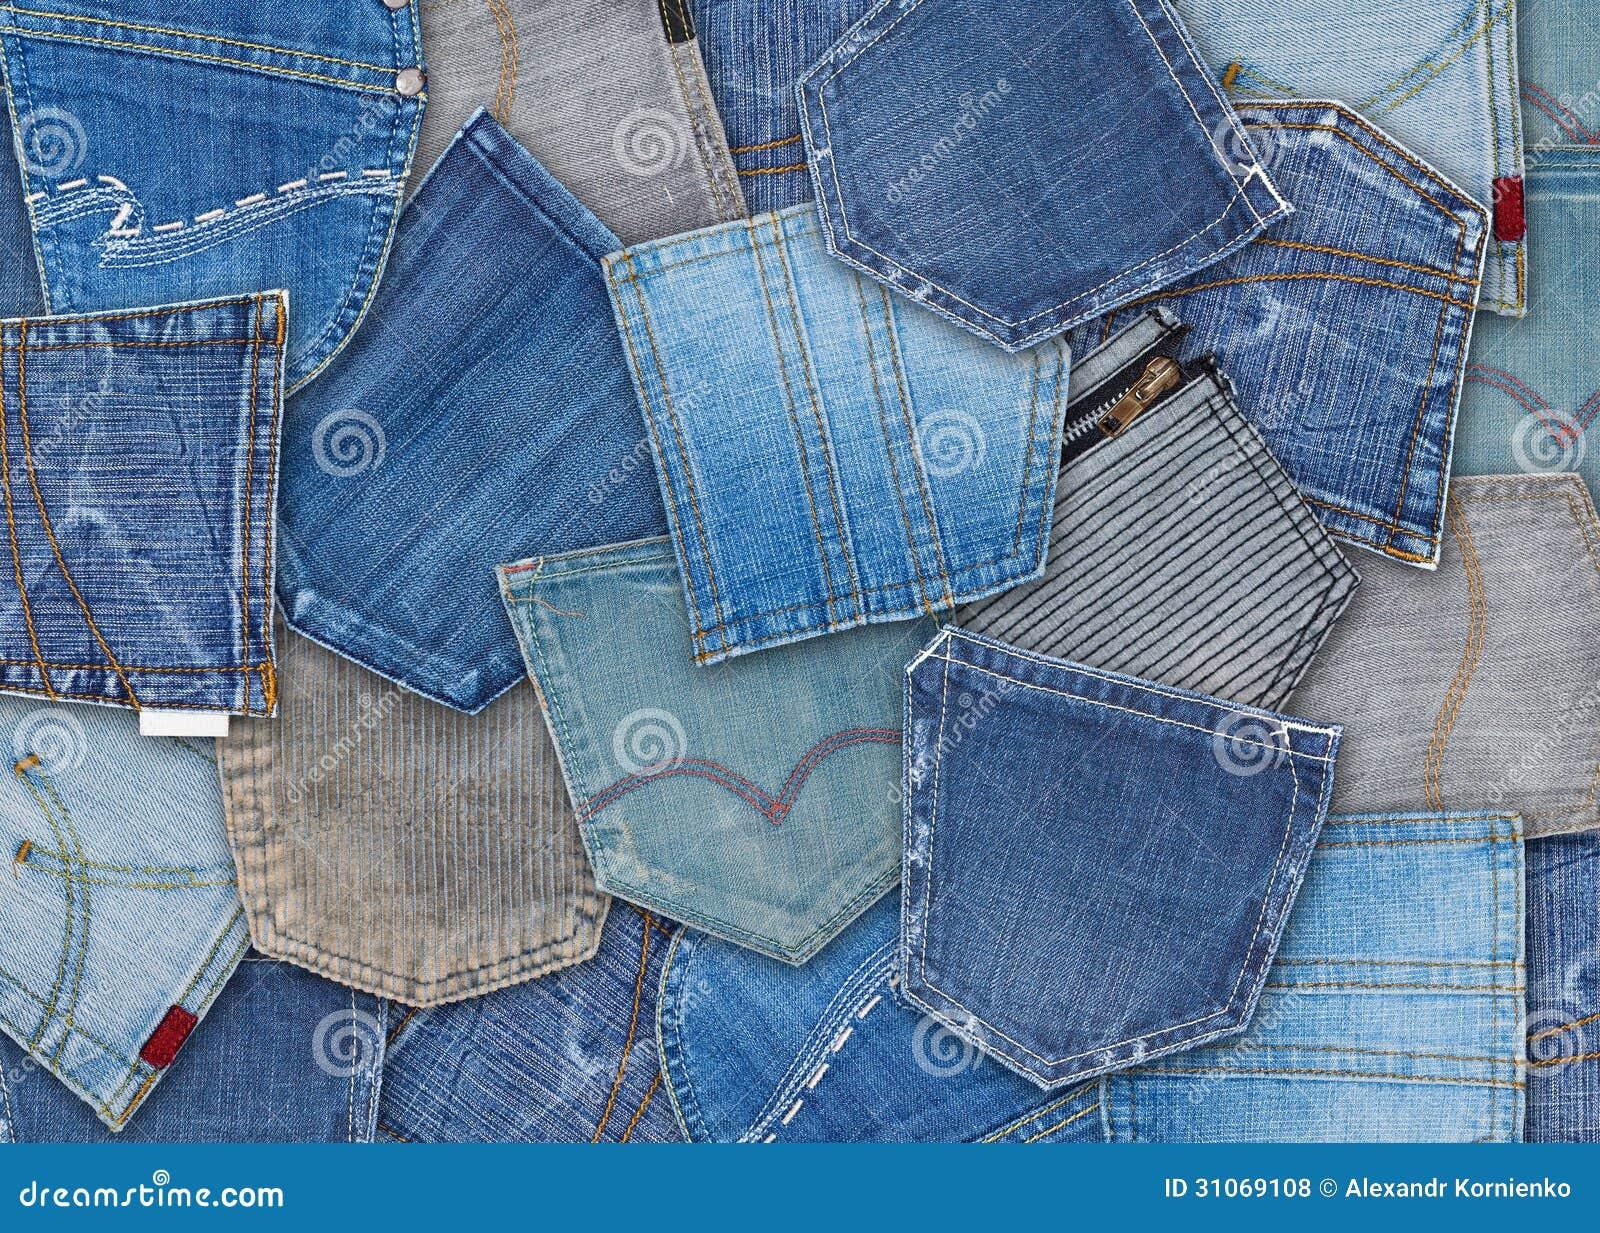 Jeans Pocket Royalty Free Stock Photos - Image 31069108